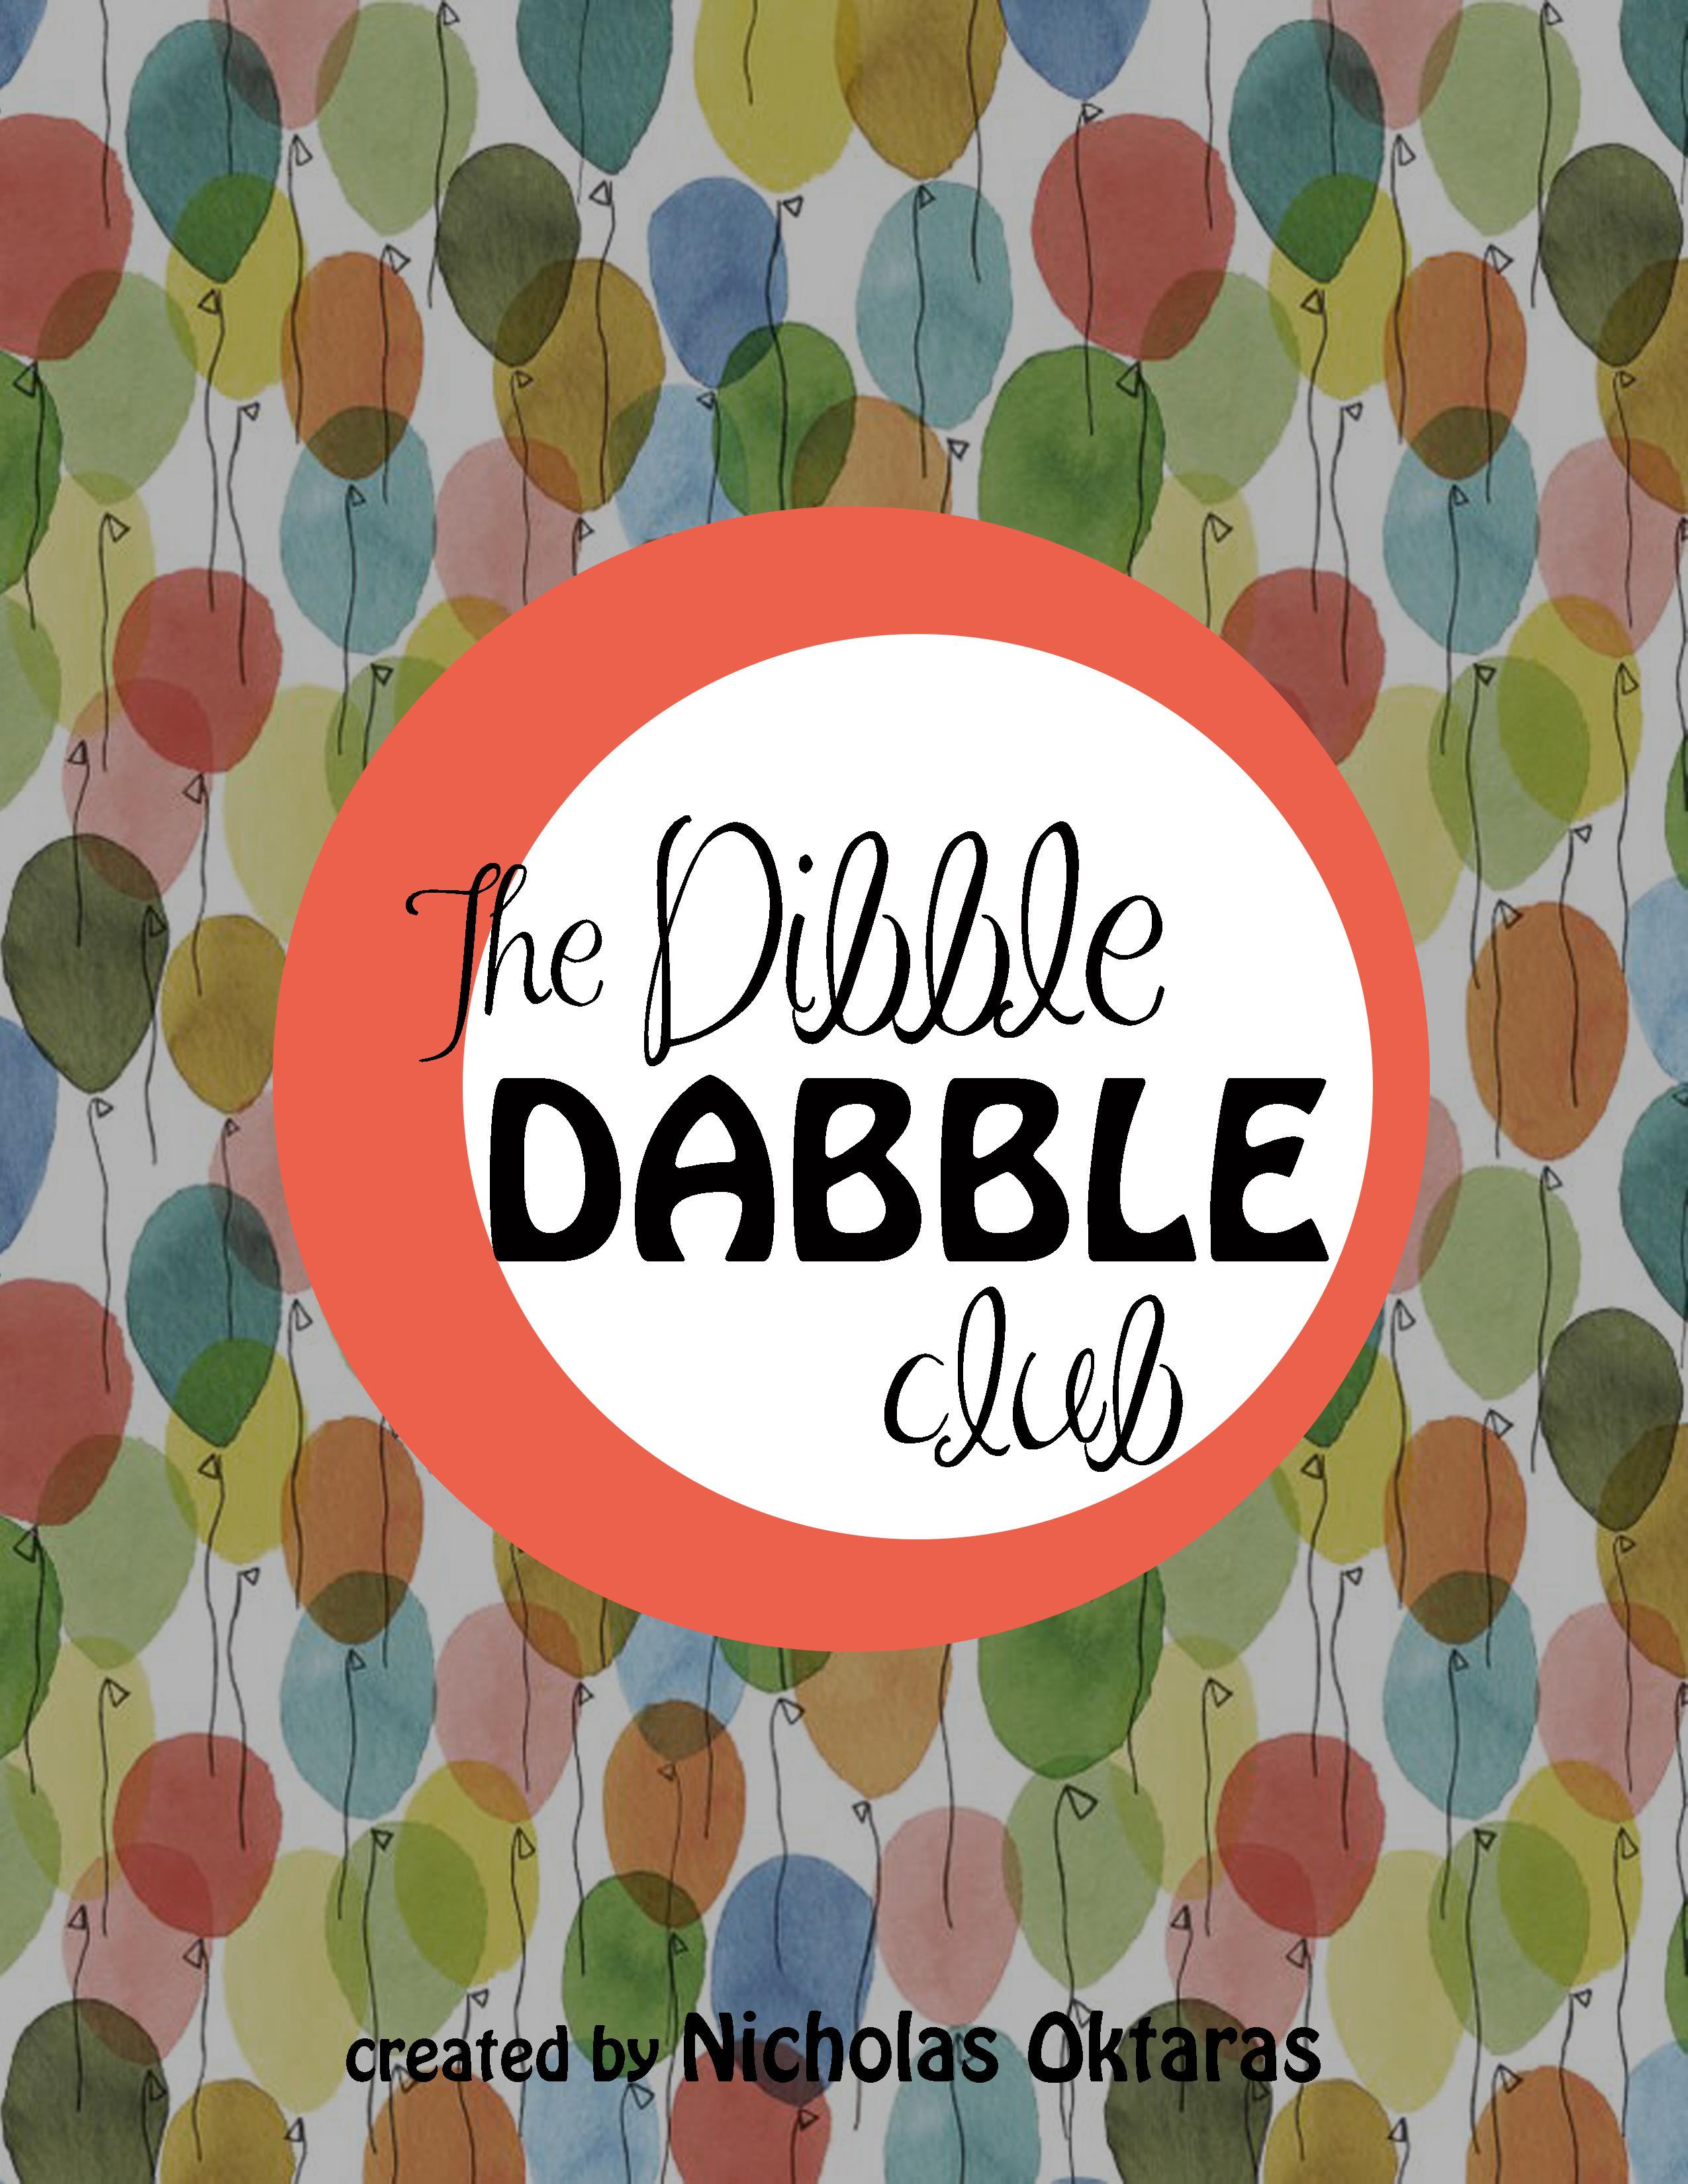 The Dibble Dabble Club TV Series written and created by Nicholas Oktaras